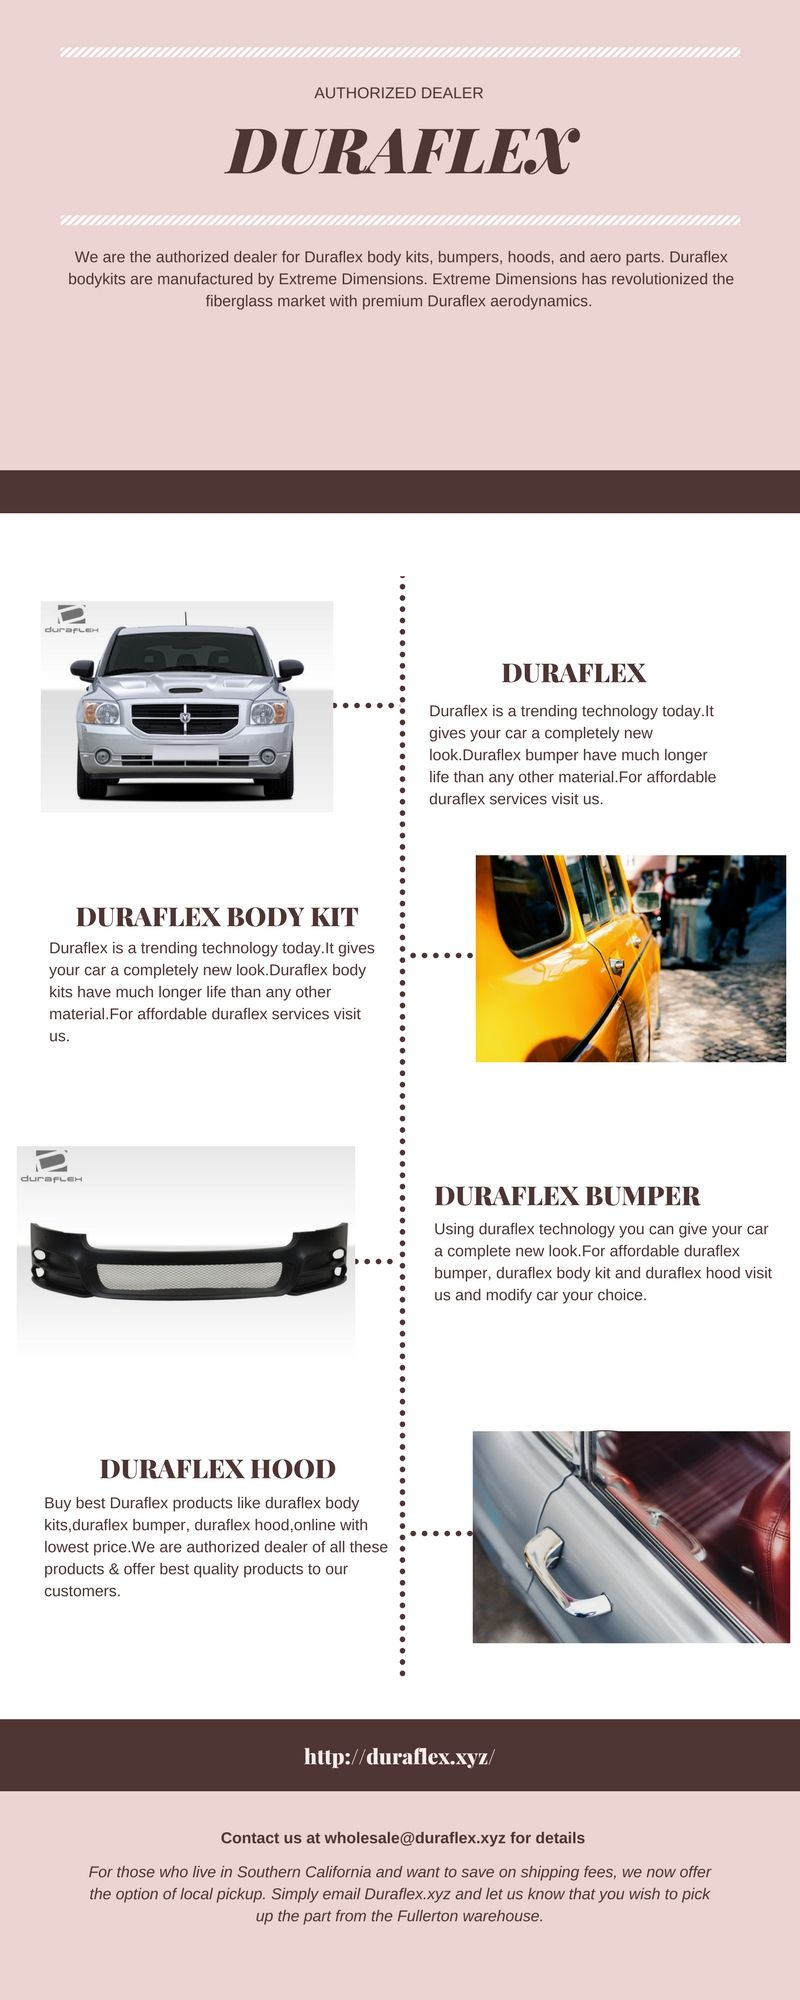 Buy best Duraflex products like duraflex body kits,duraflex bumper